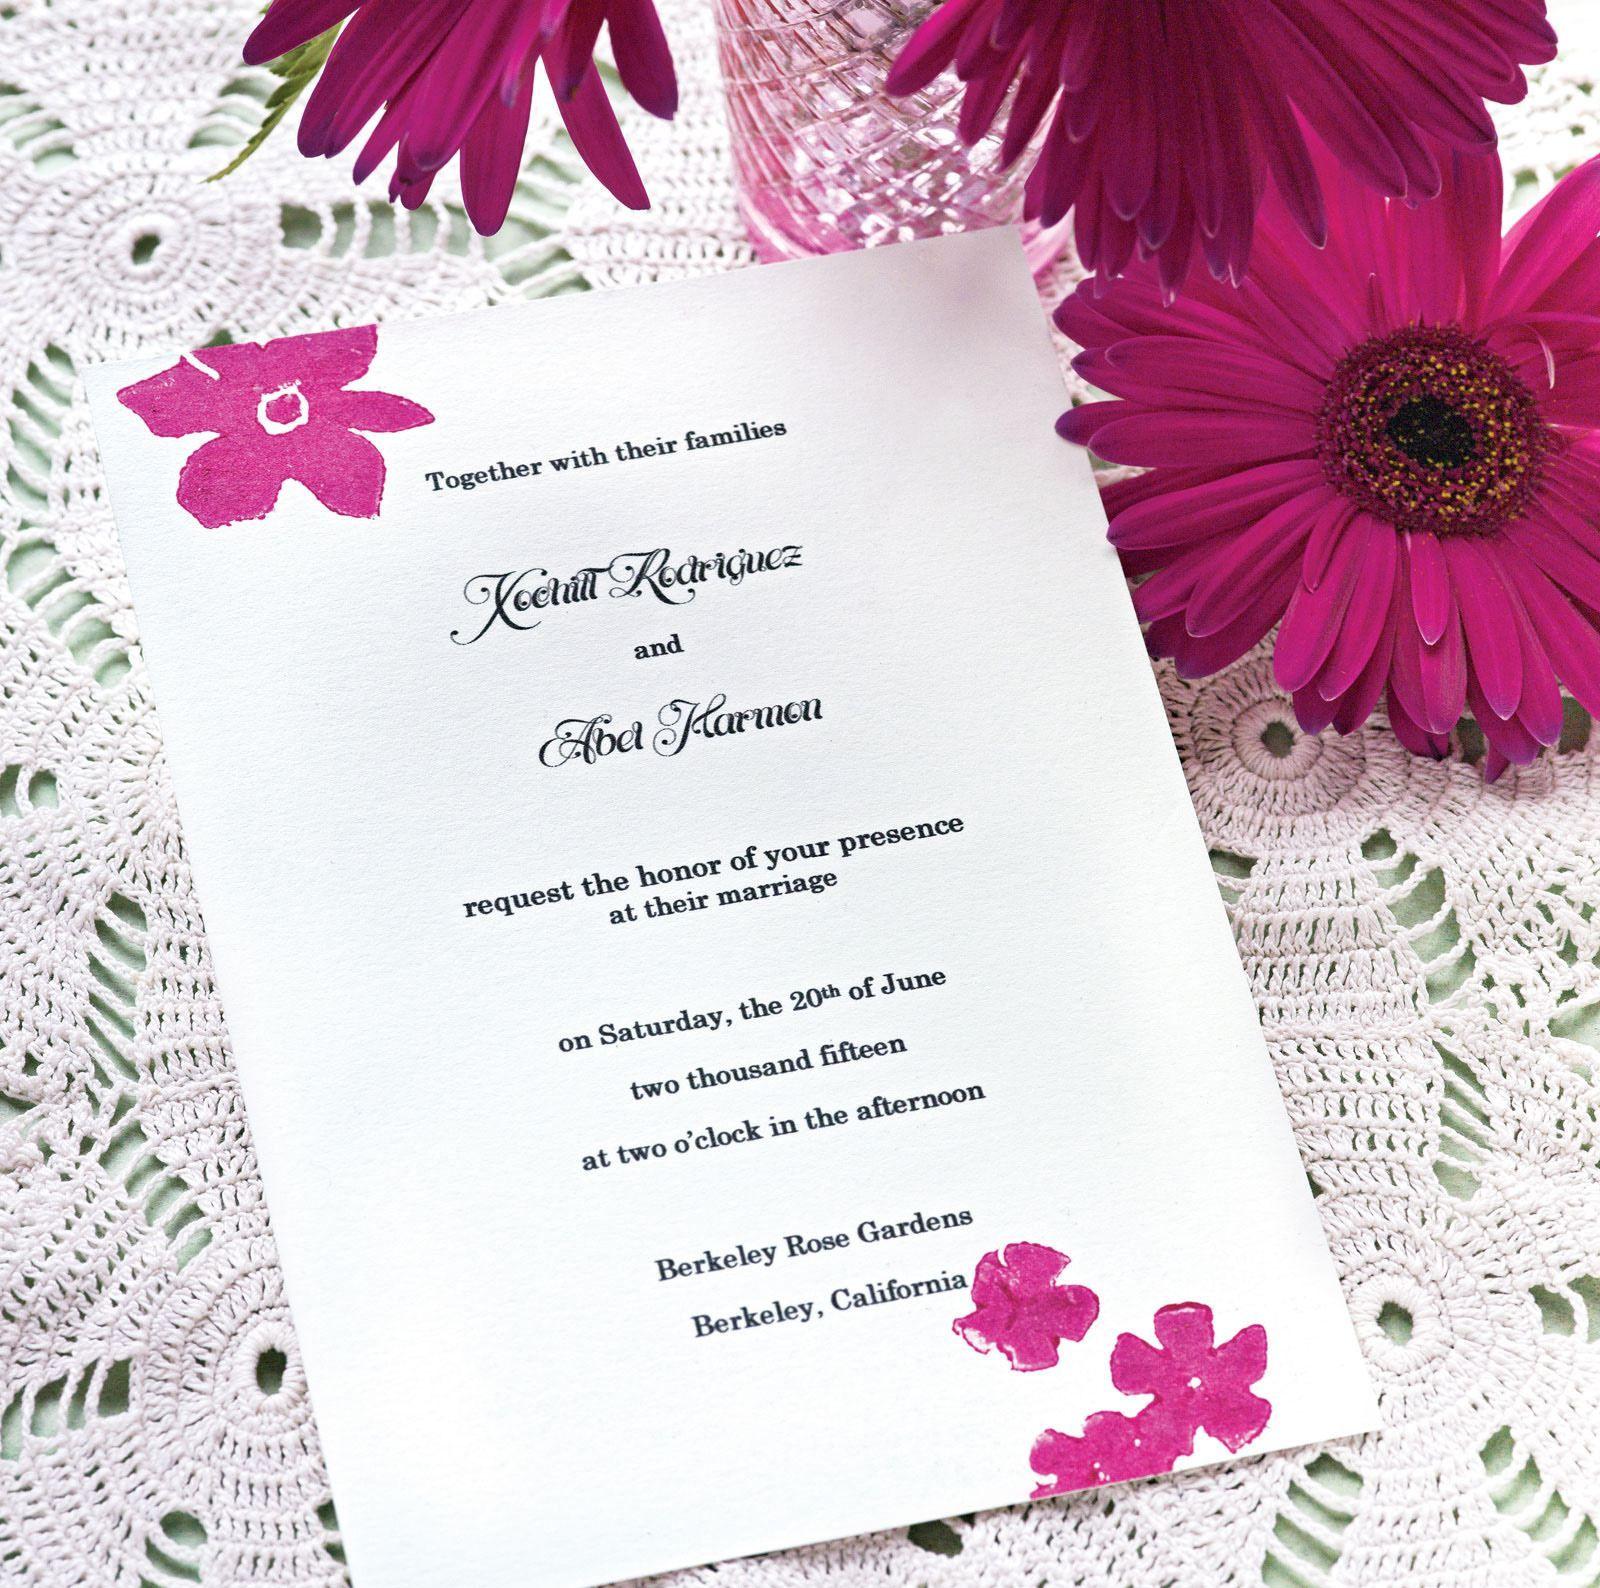 Wedding invitation cards and wordings wedding invitations wedding invitation cards and wordings stopboris Gallery